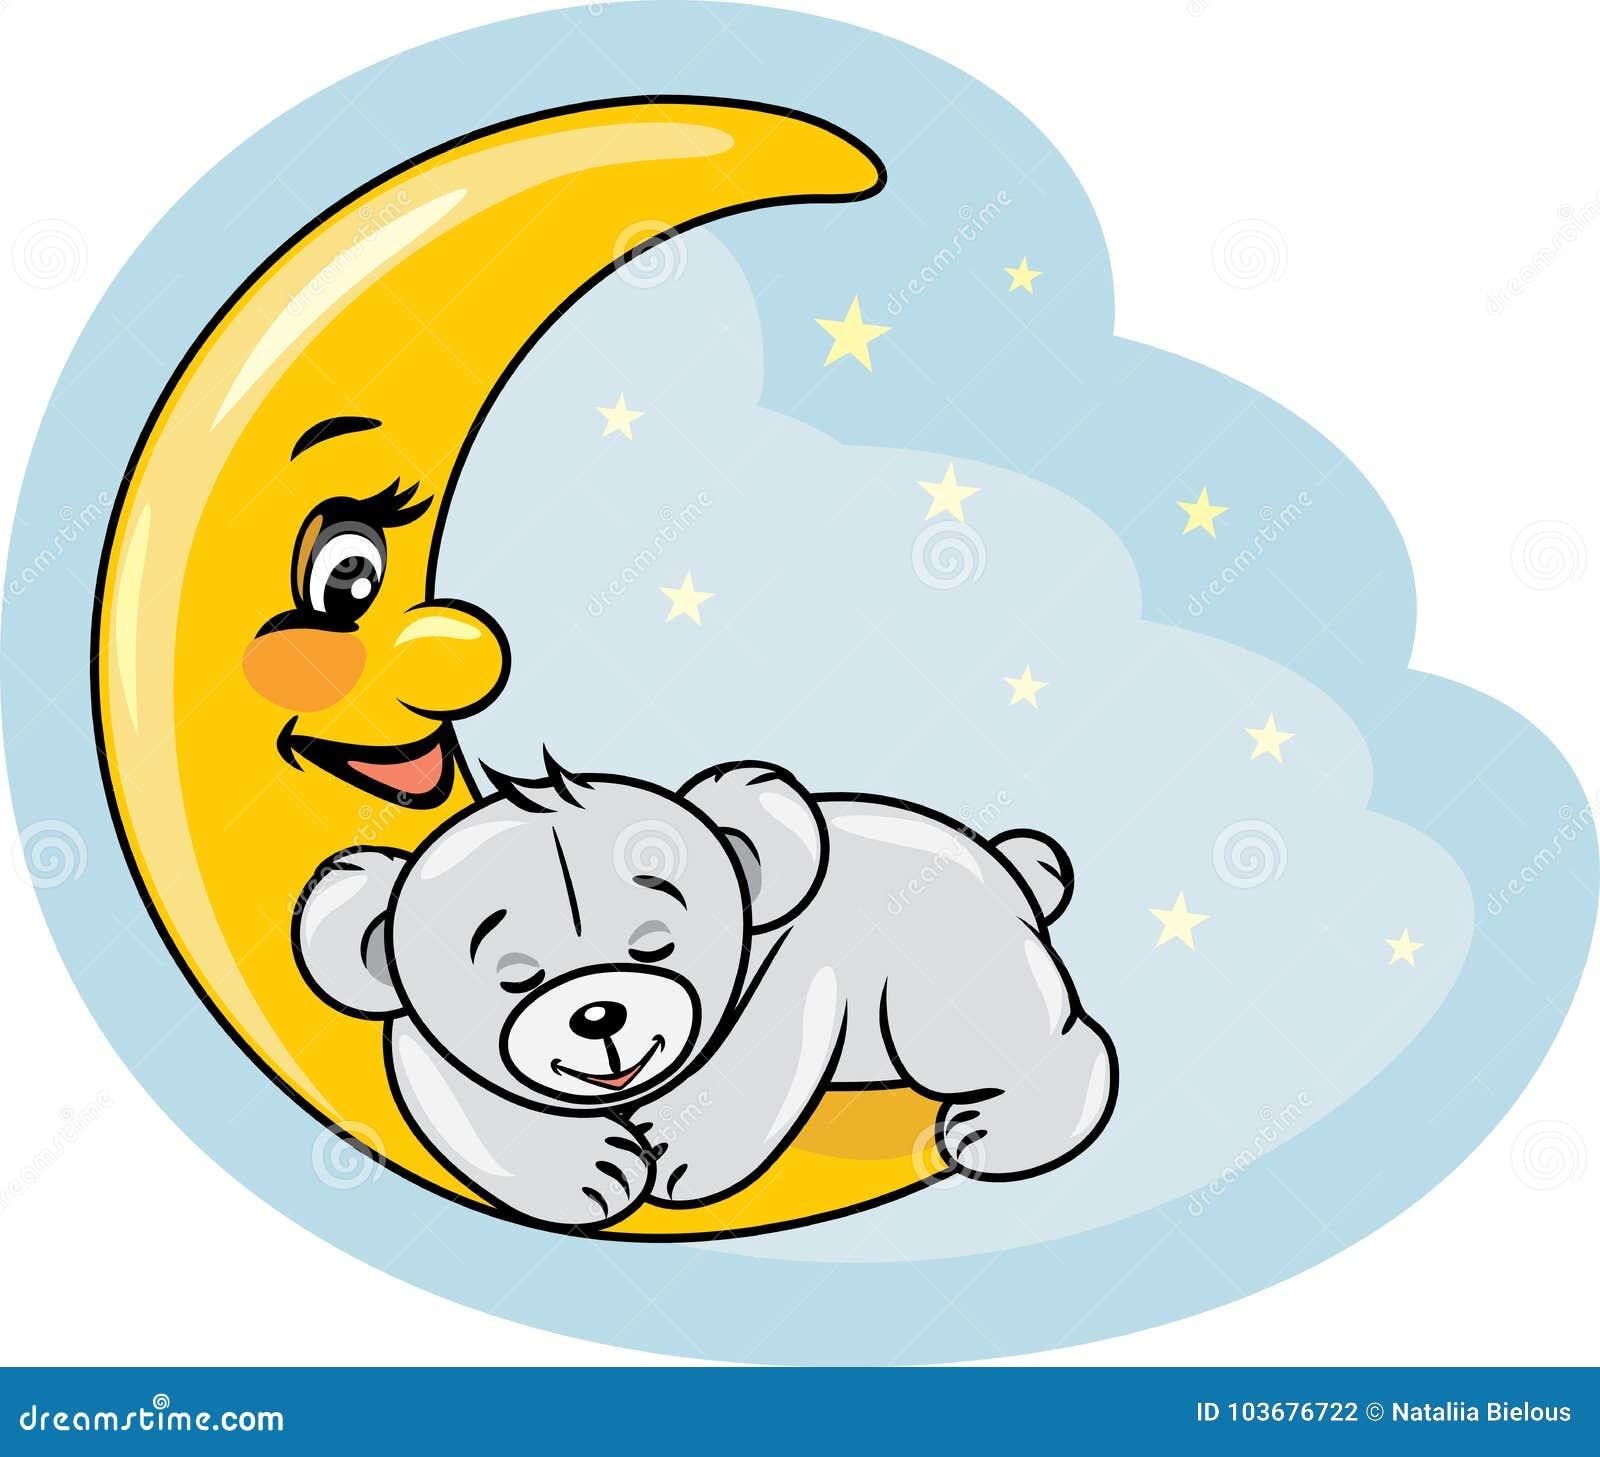 Urso de peluche do sono na lua